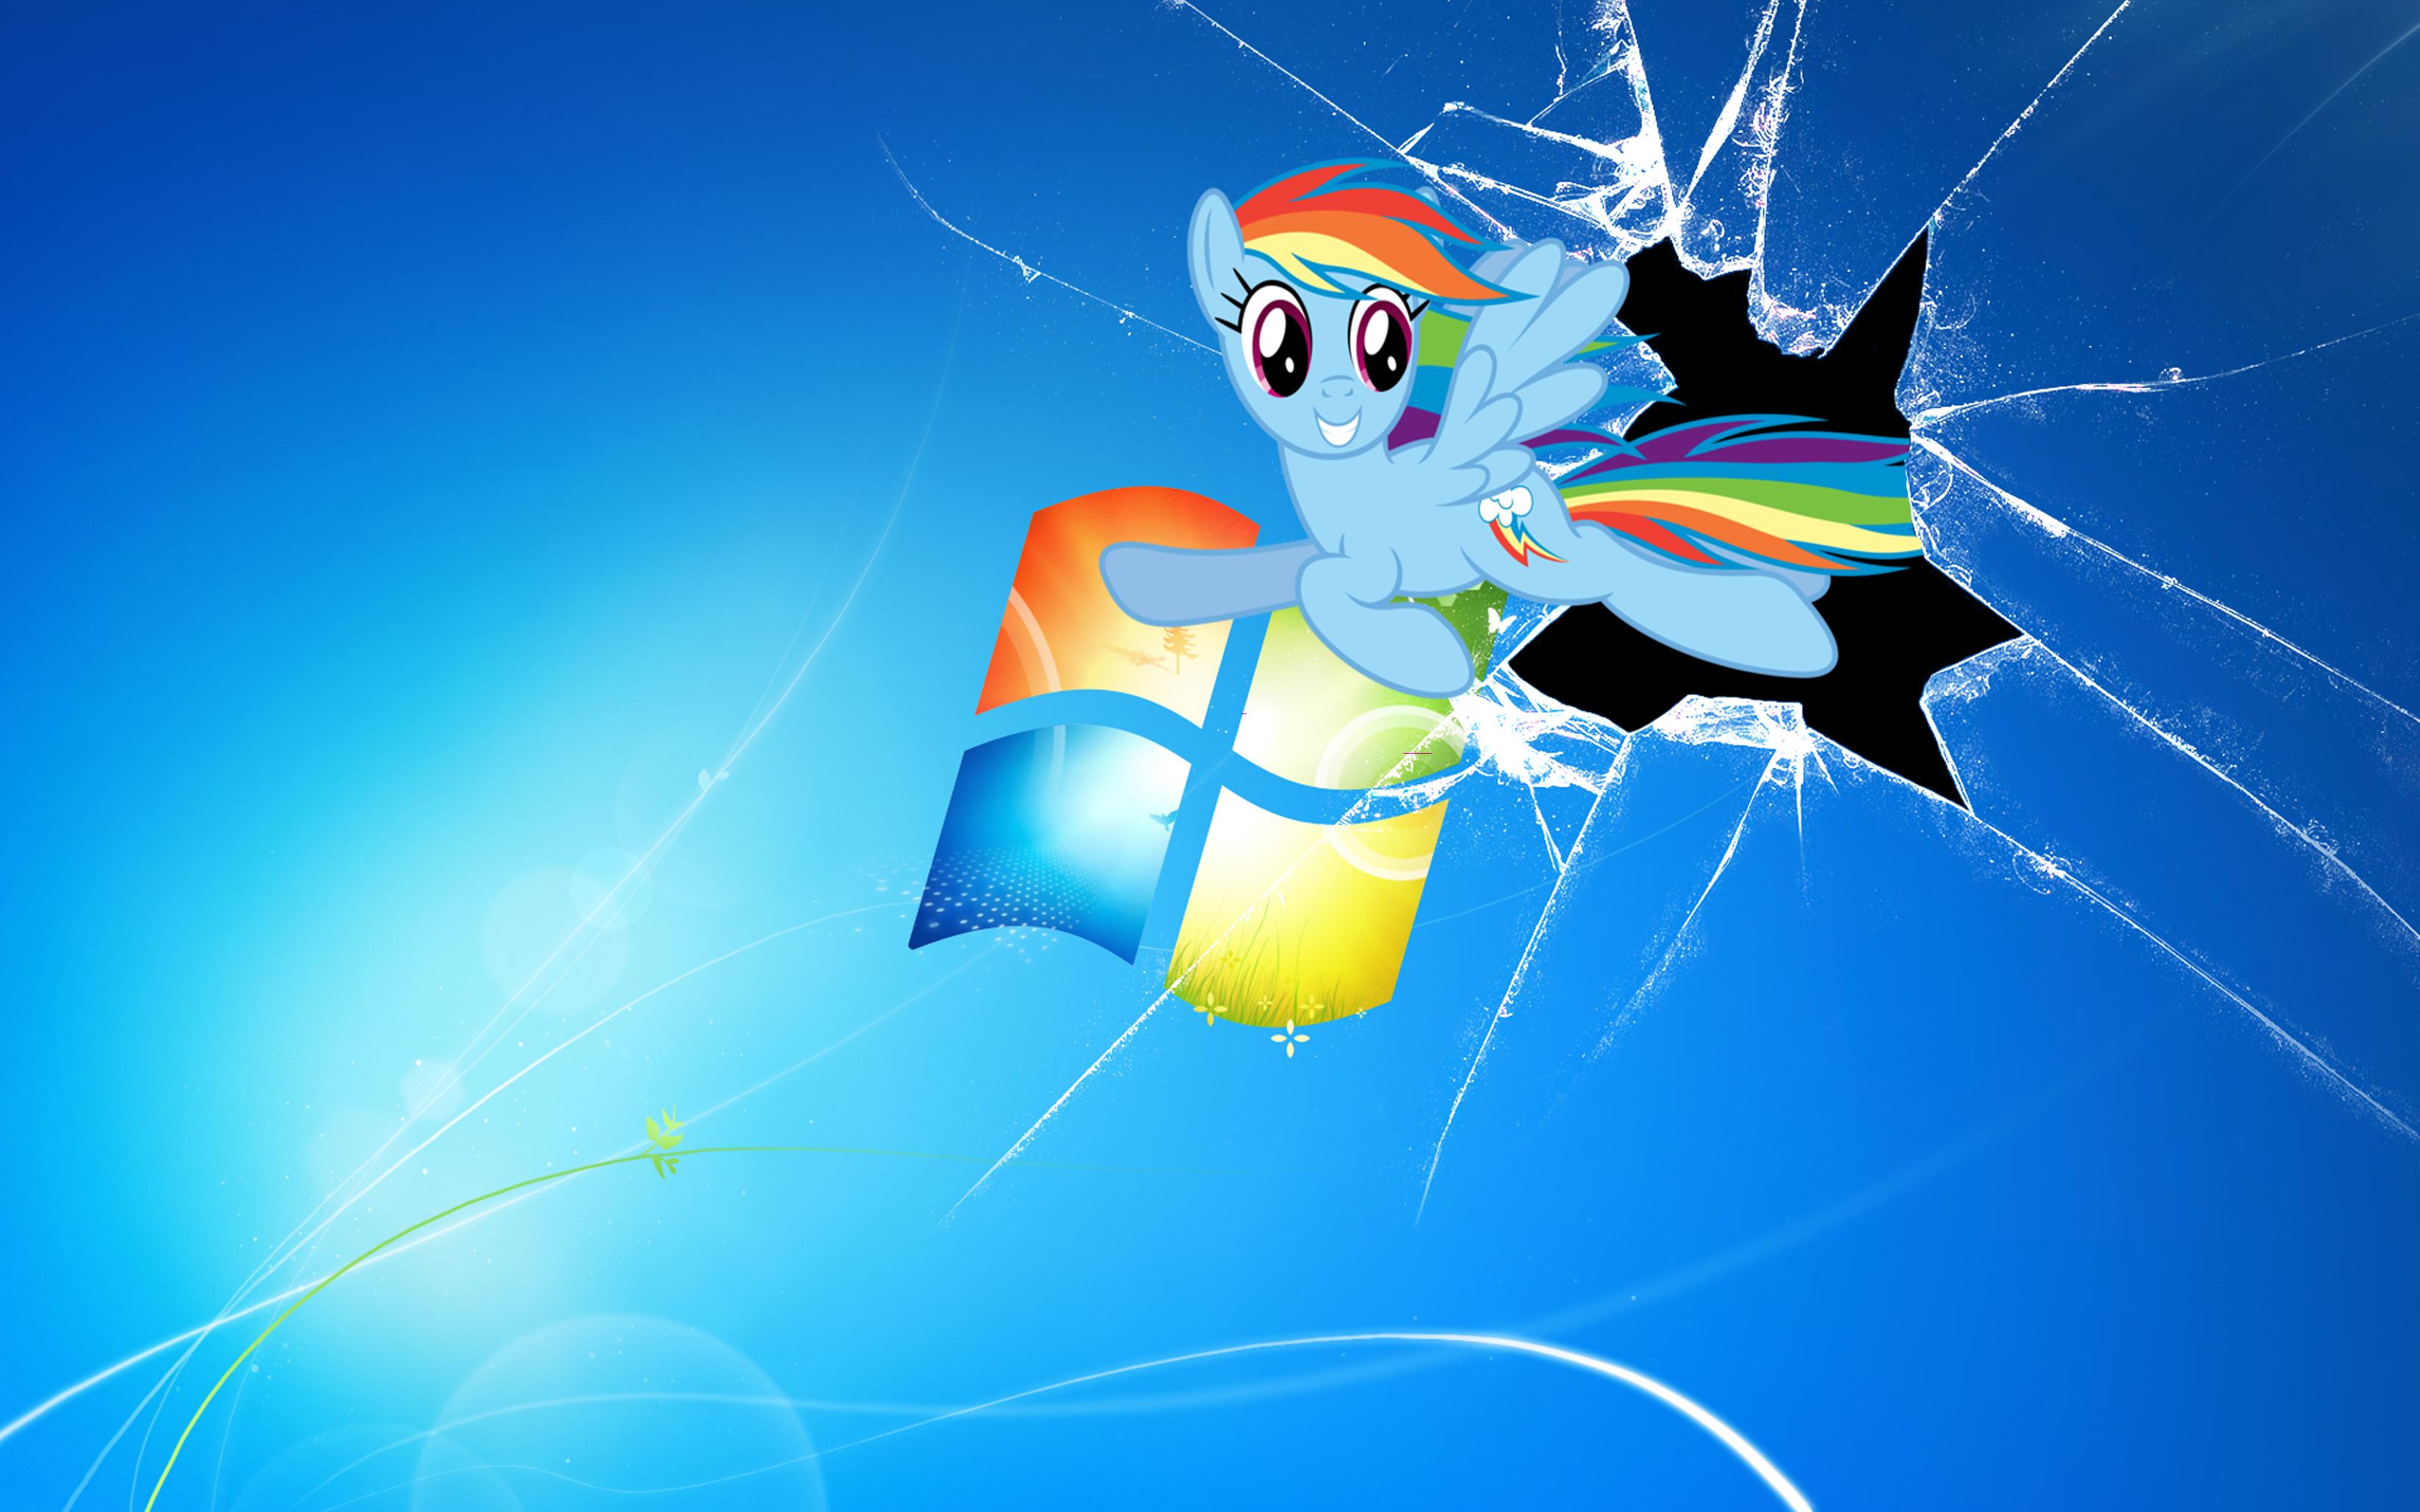 Cracked Screen Wallpaper Windows 8 Rainbowdash windows wallpaper 3294x2058